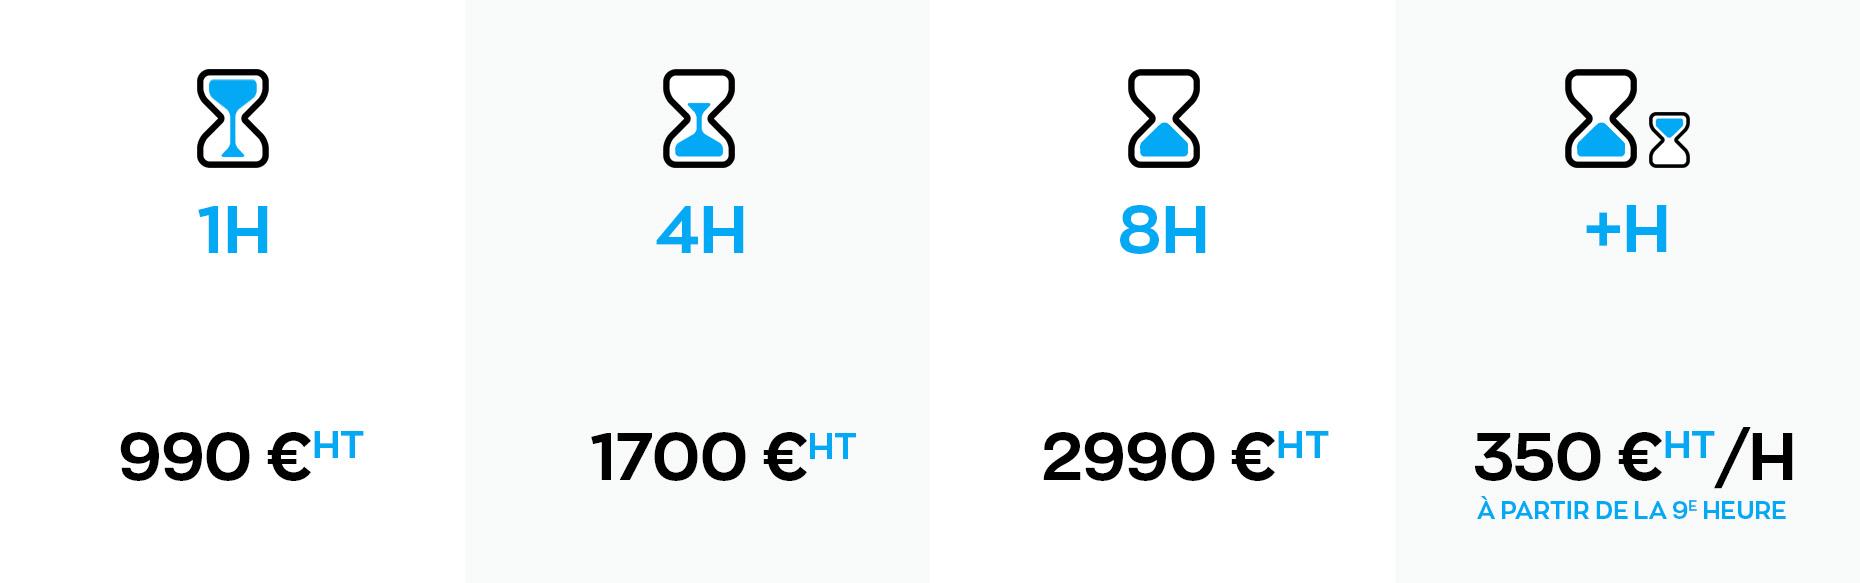 Tableau tarifs plateau